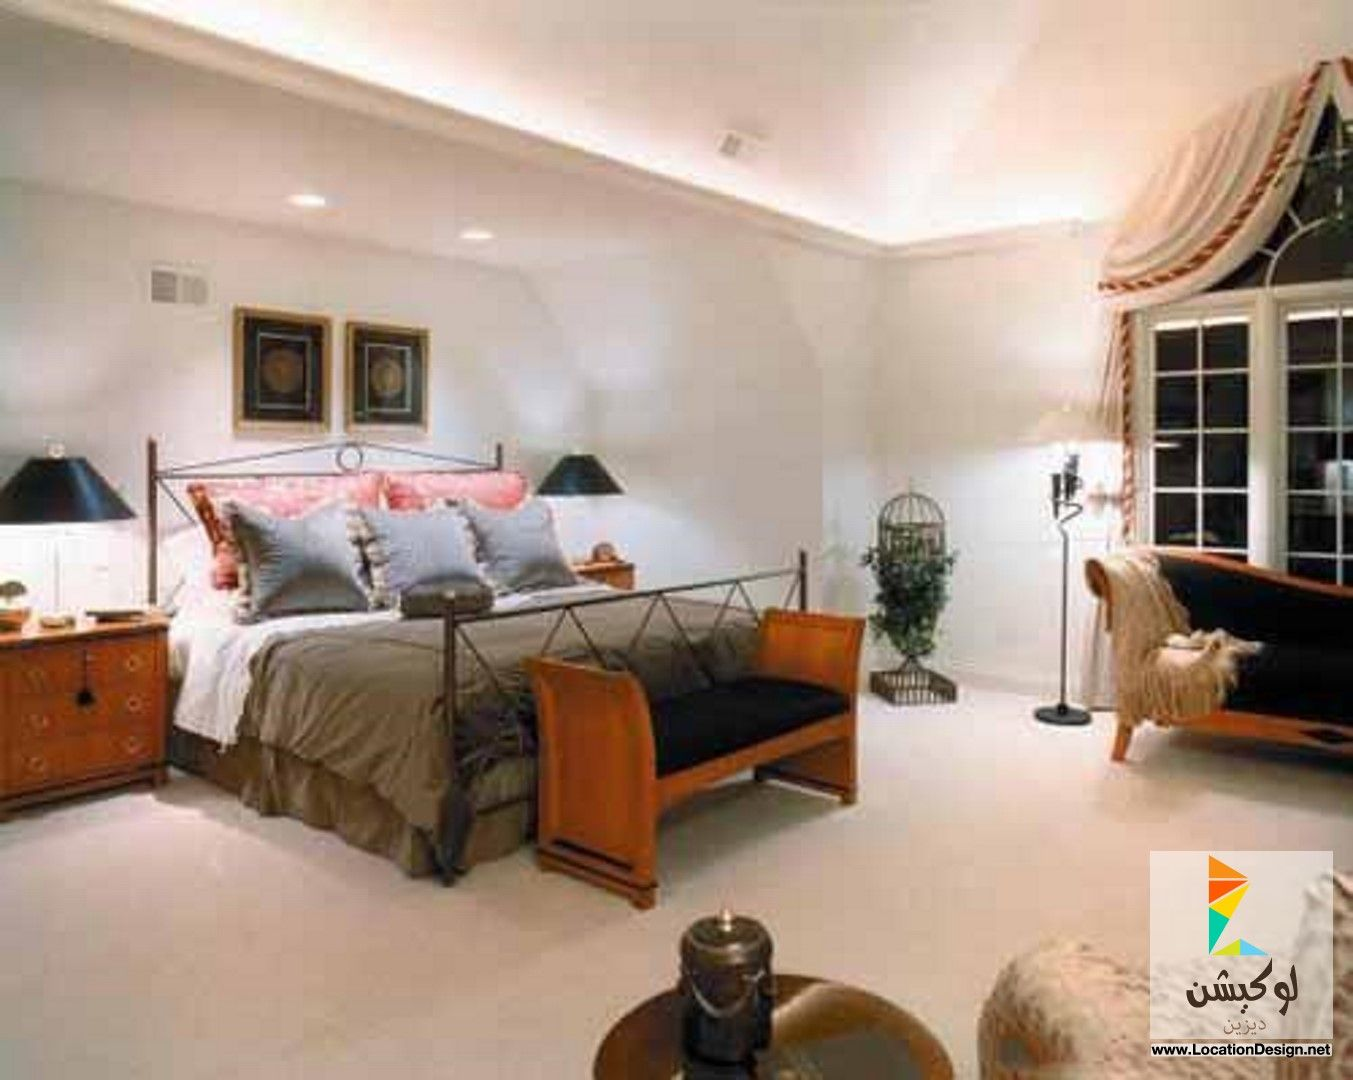 غرف نوم مودرن للمساحات الصغيرة لوكيشن ديزاين تصميمات ديكورات أفكار جديدة مصر Locationdesign Com Home Decor Home Furniture